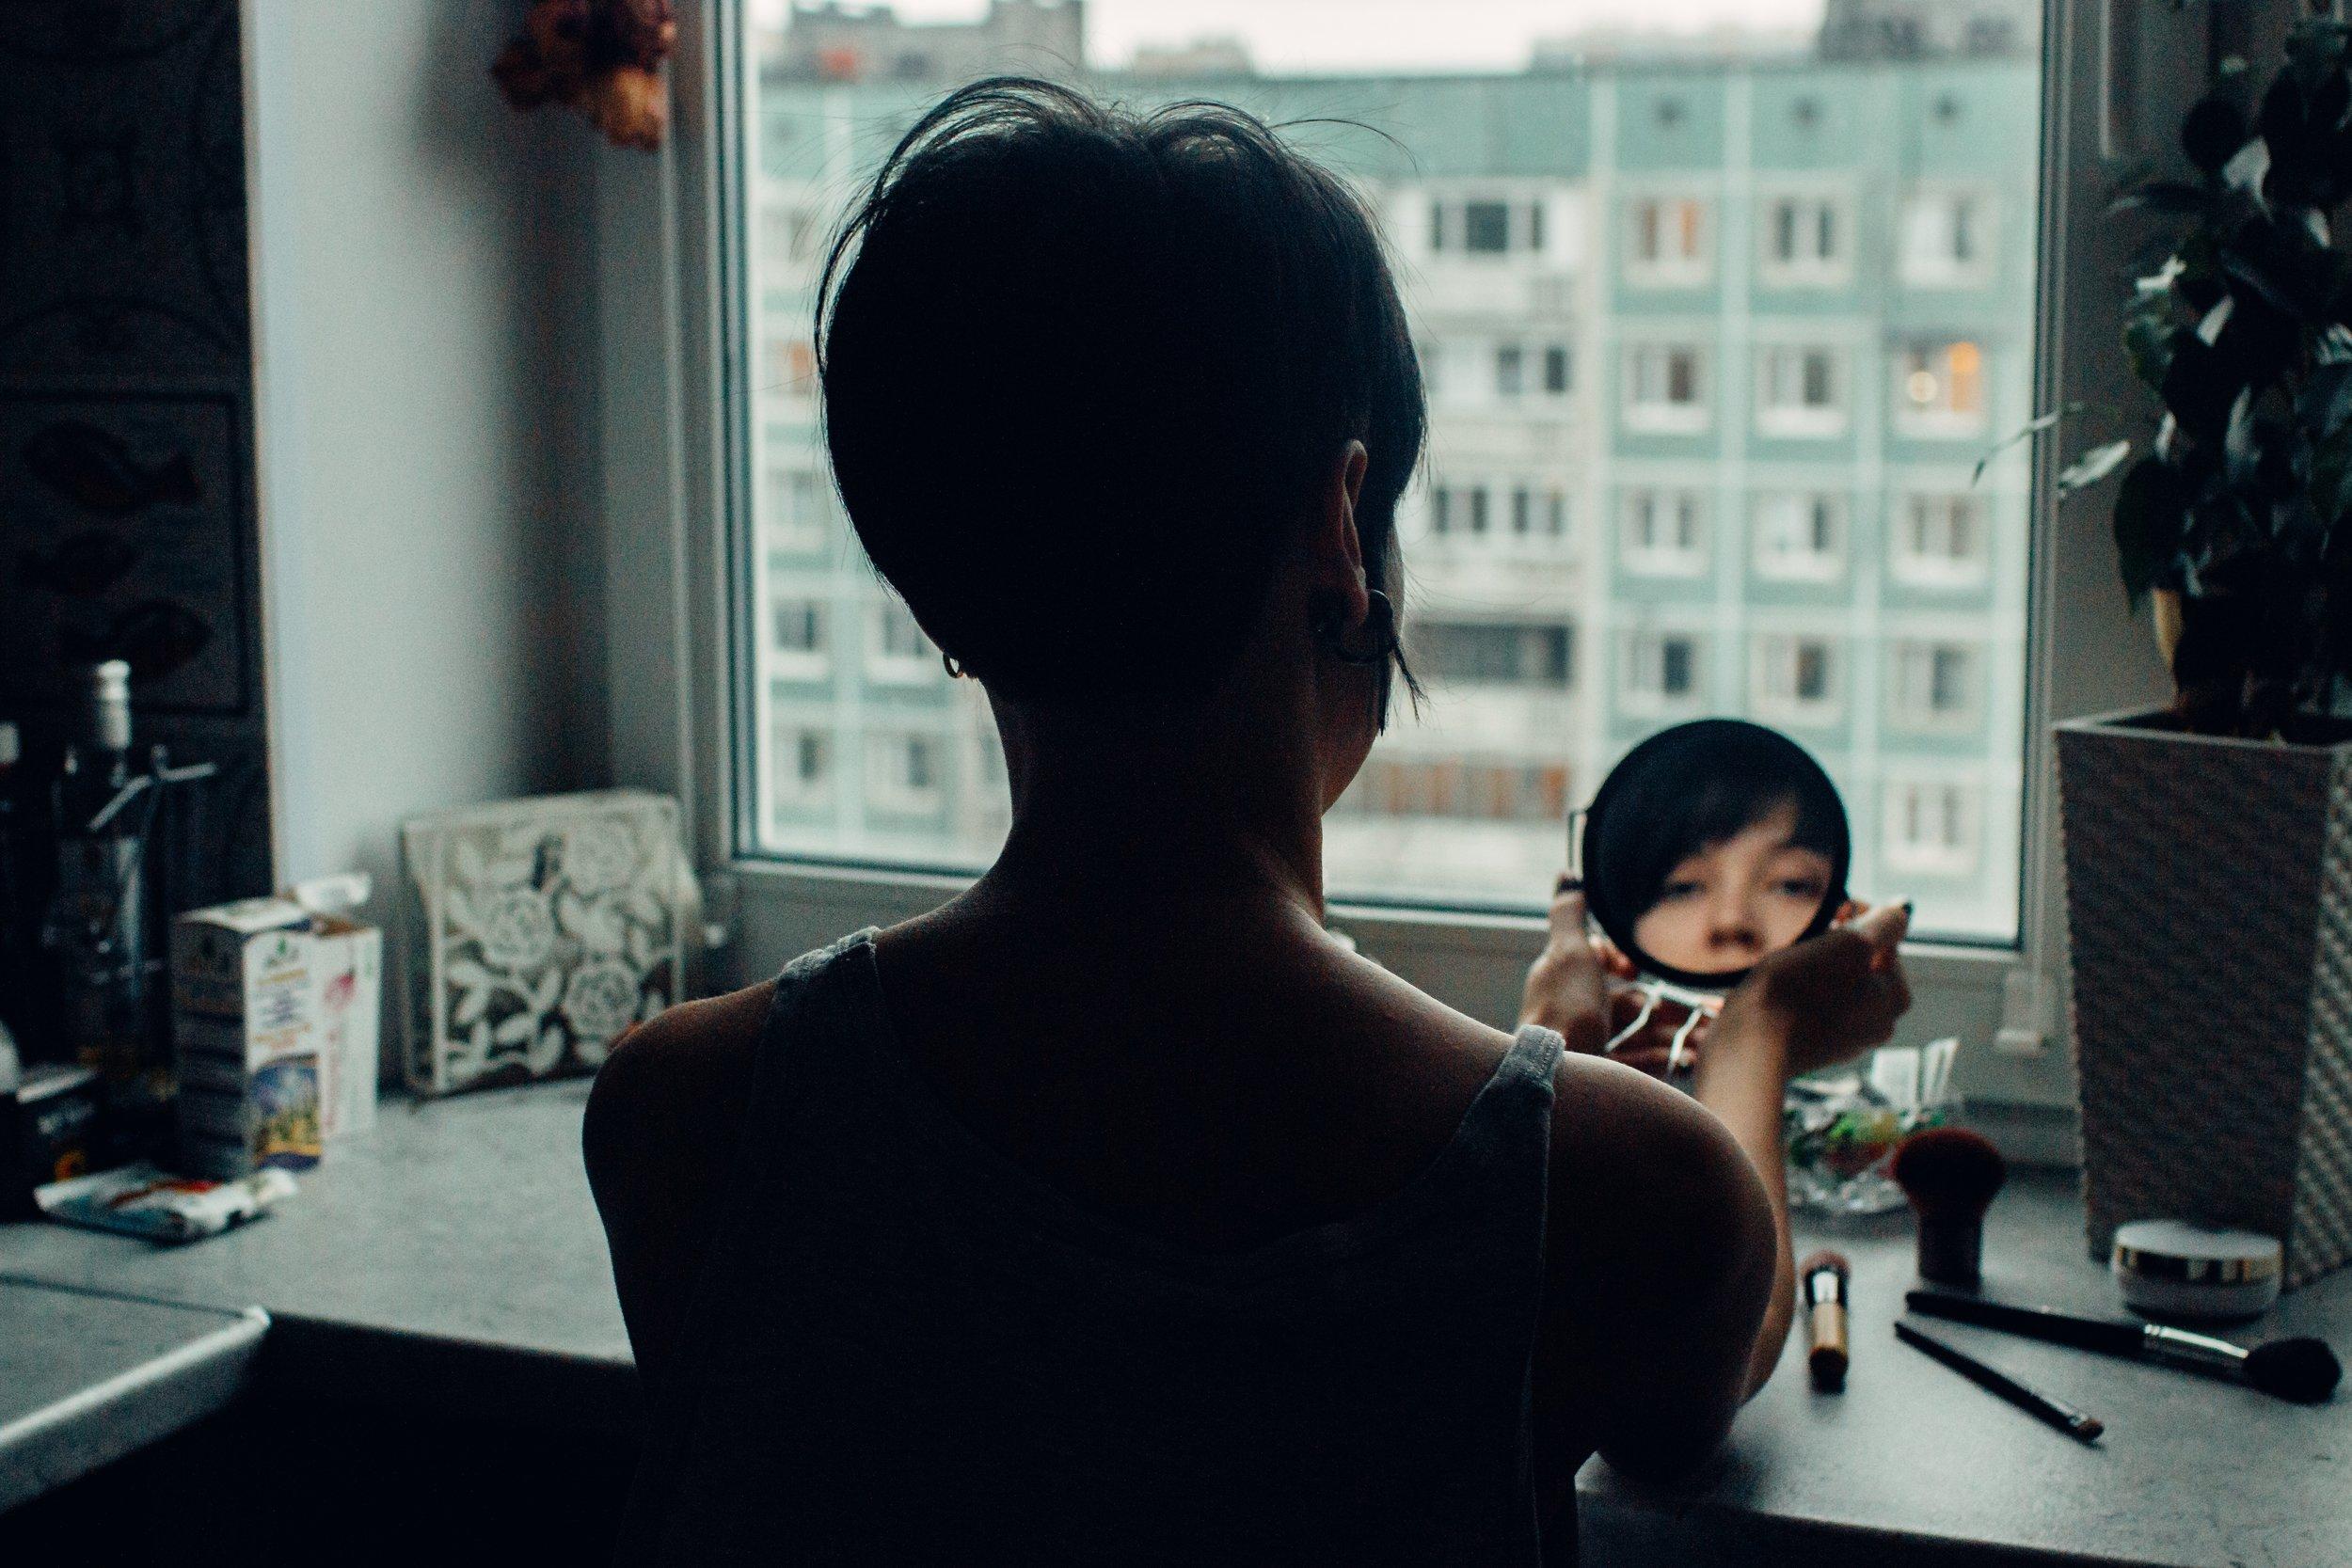 alina-miroshnichenko-472669-unsplash.jpg